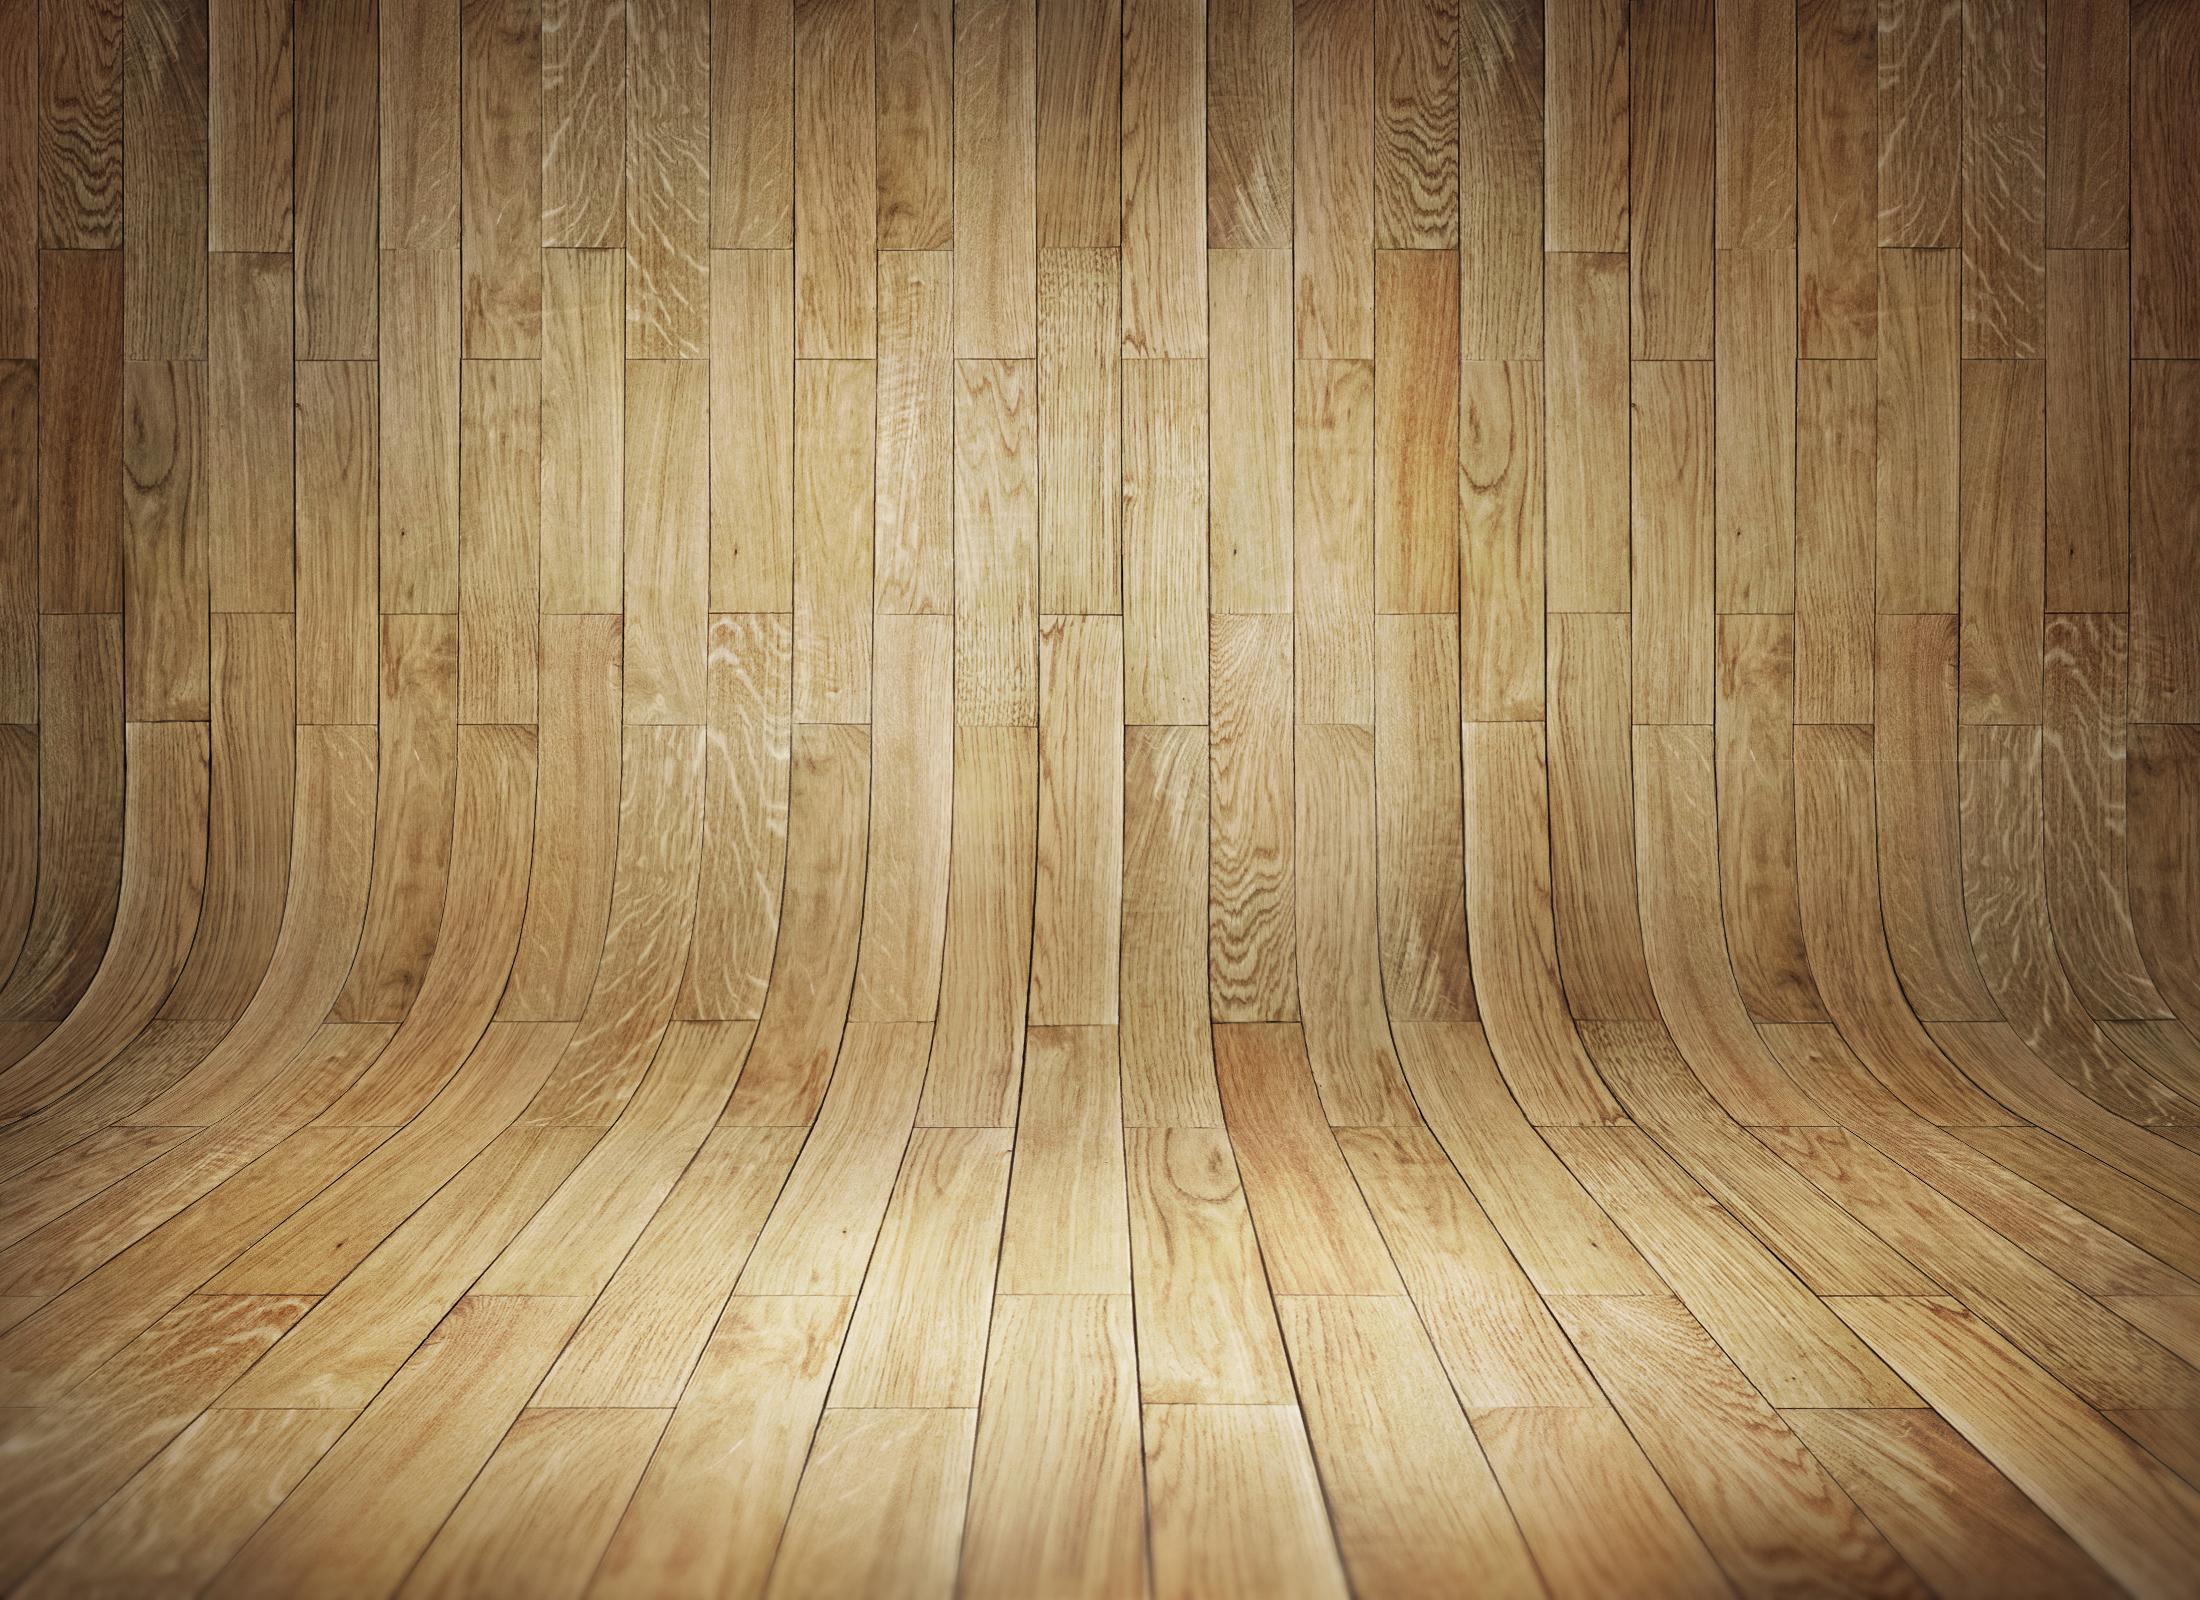 wood-background ipain - iPain Foundation